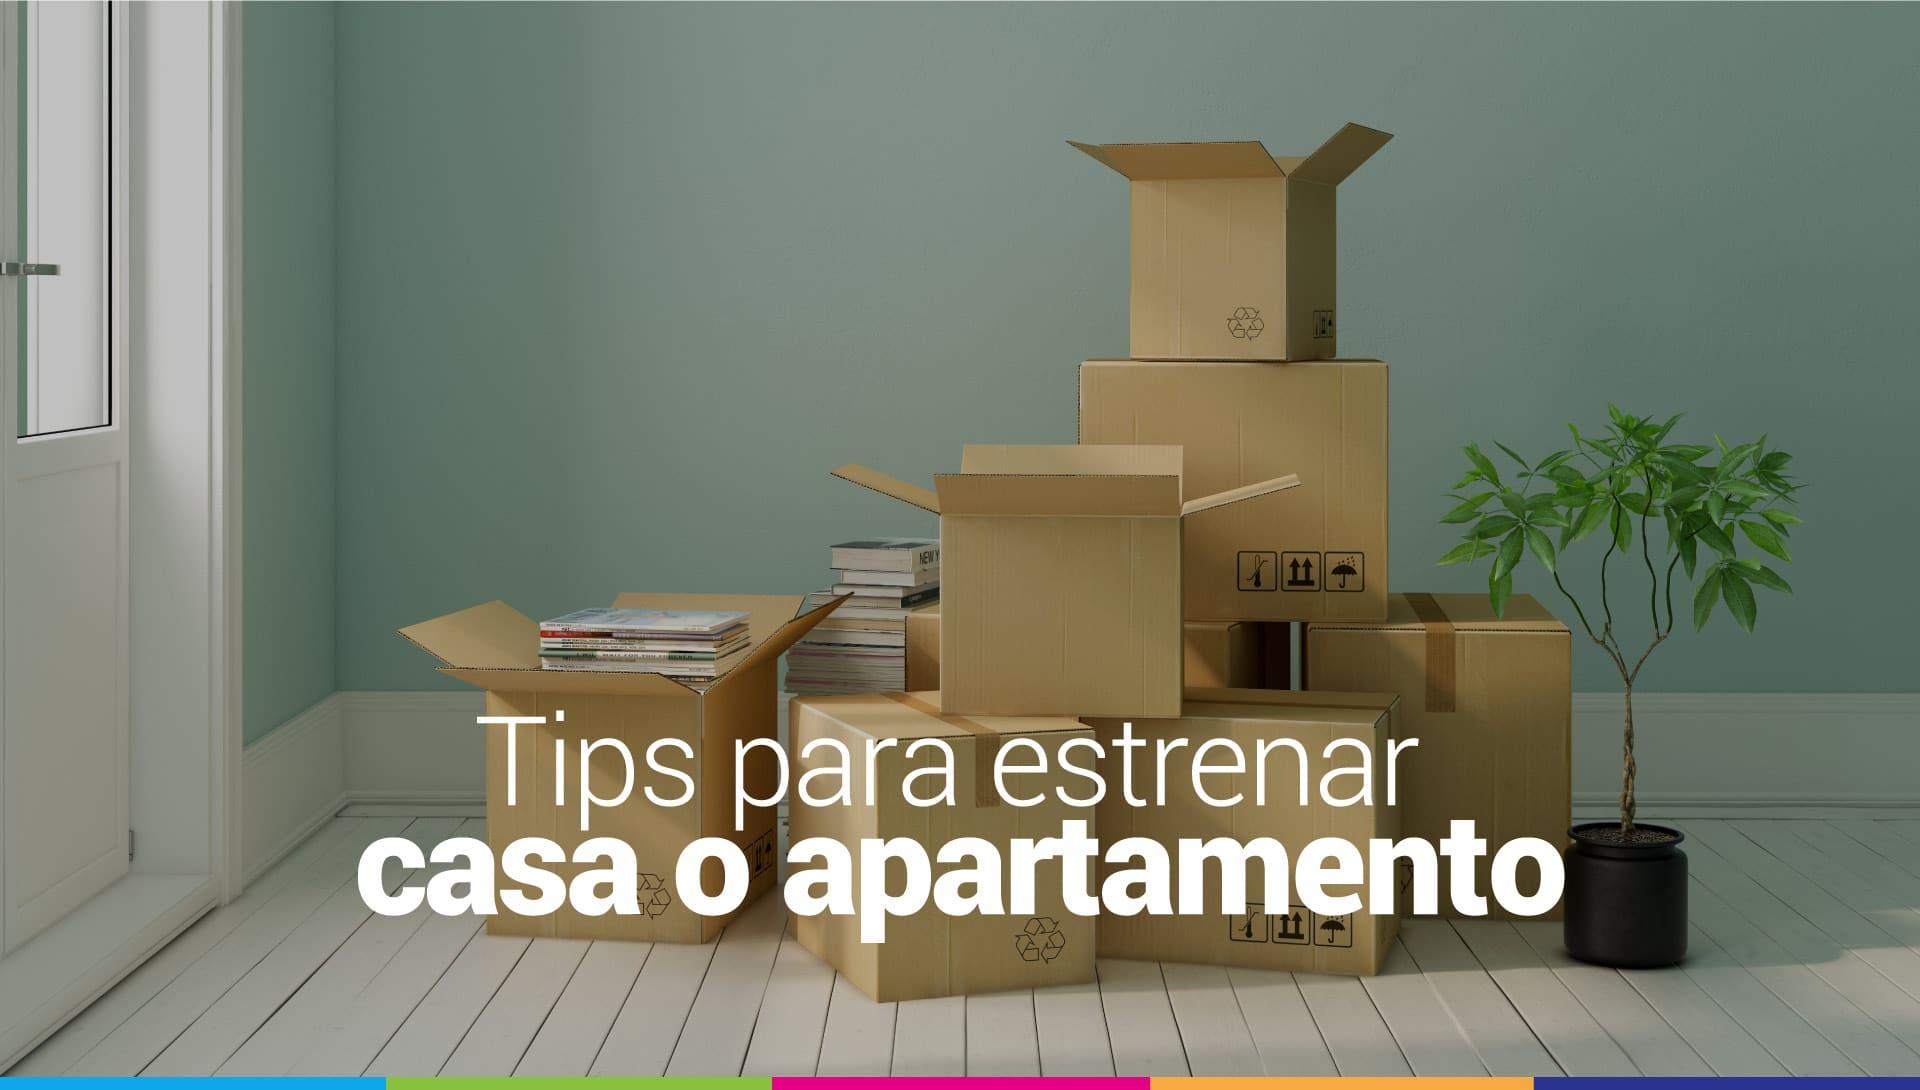 tips para estrenar apartamento